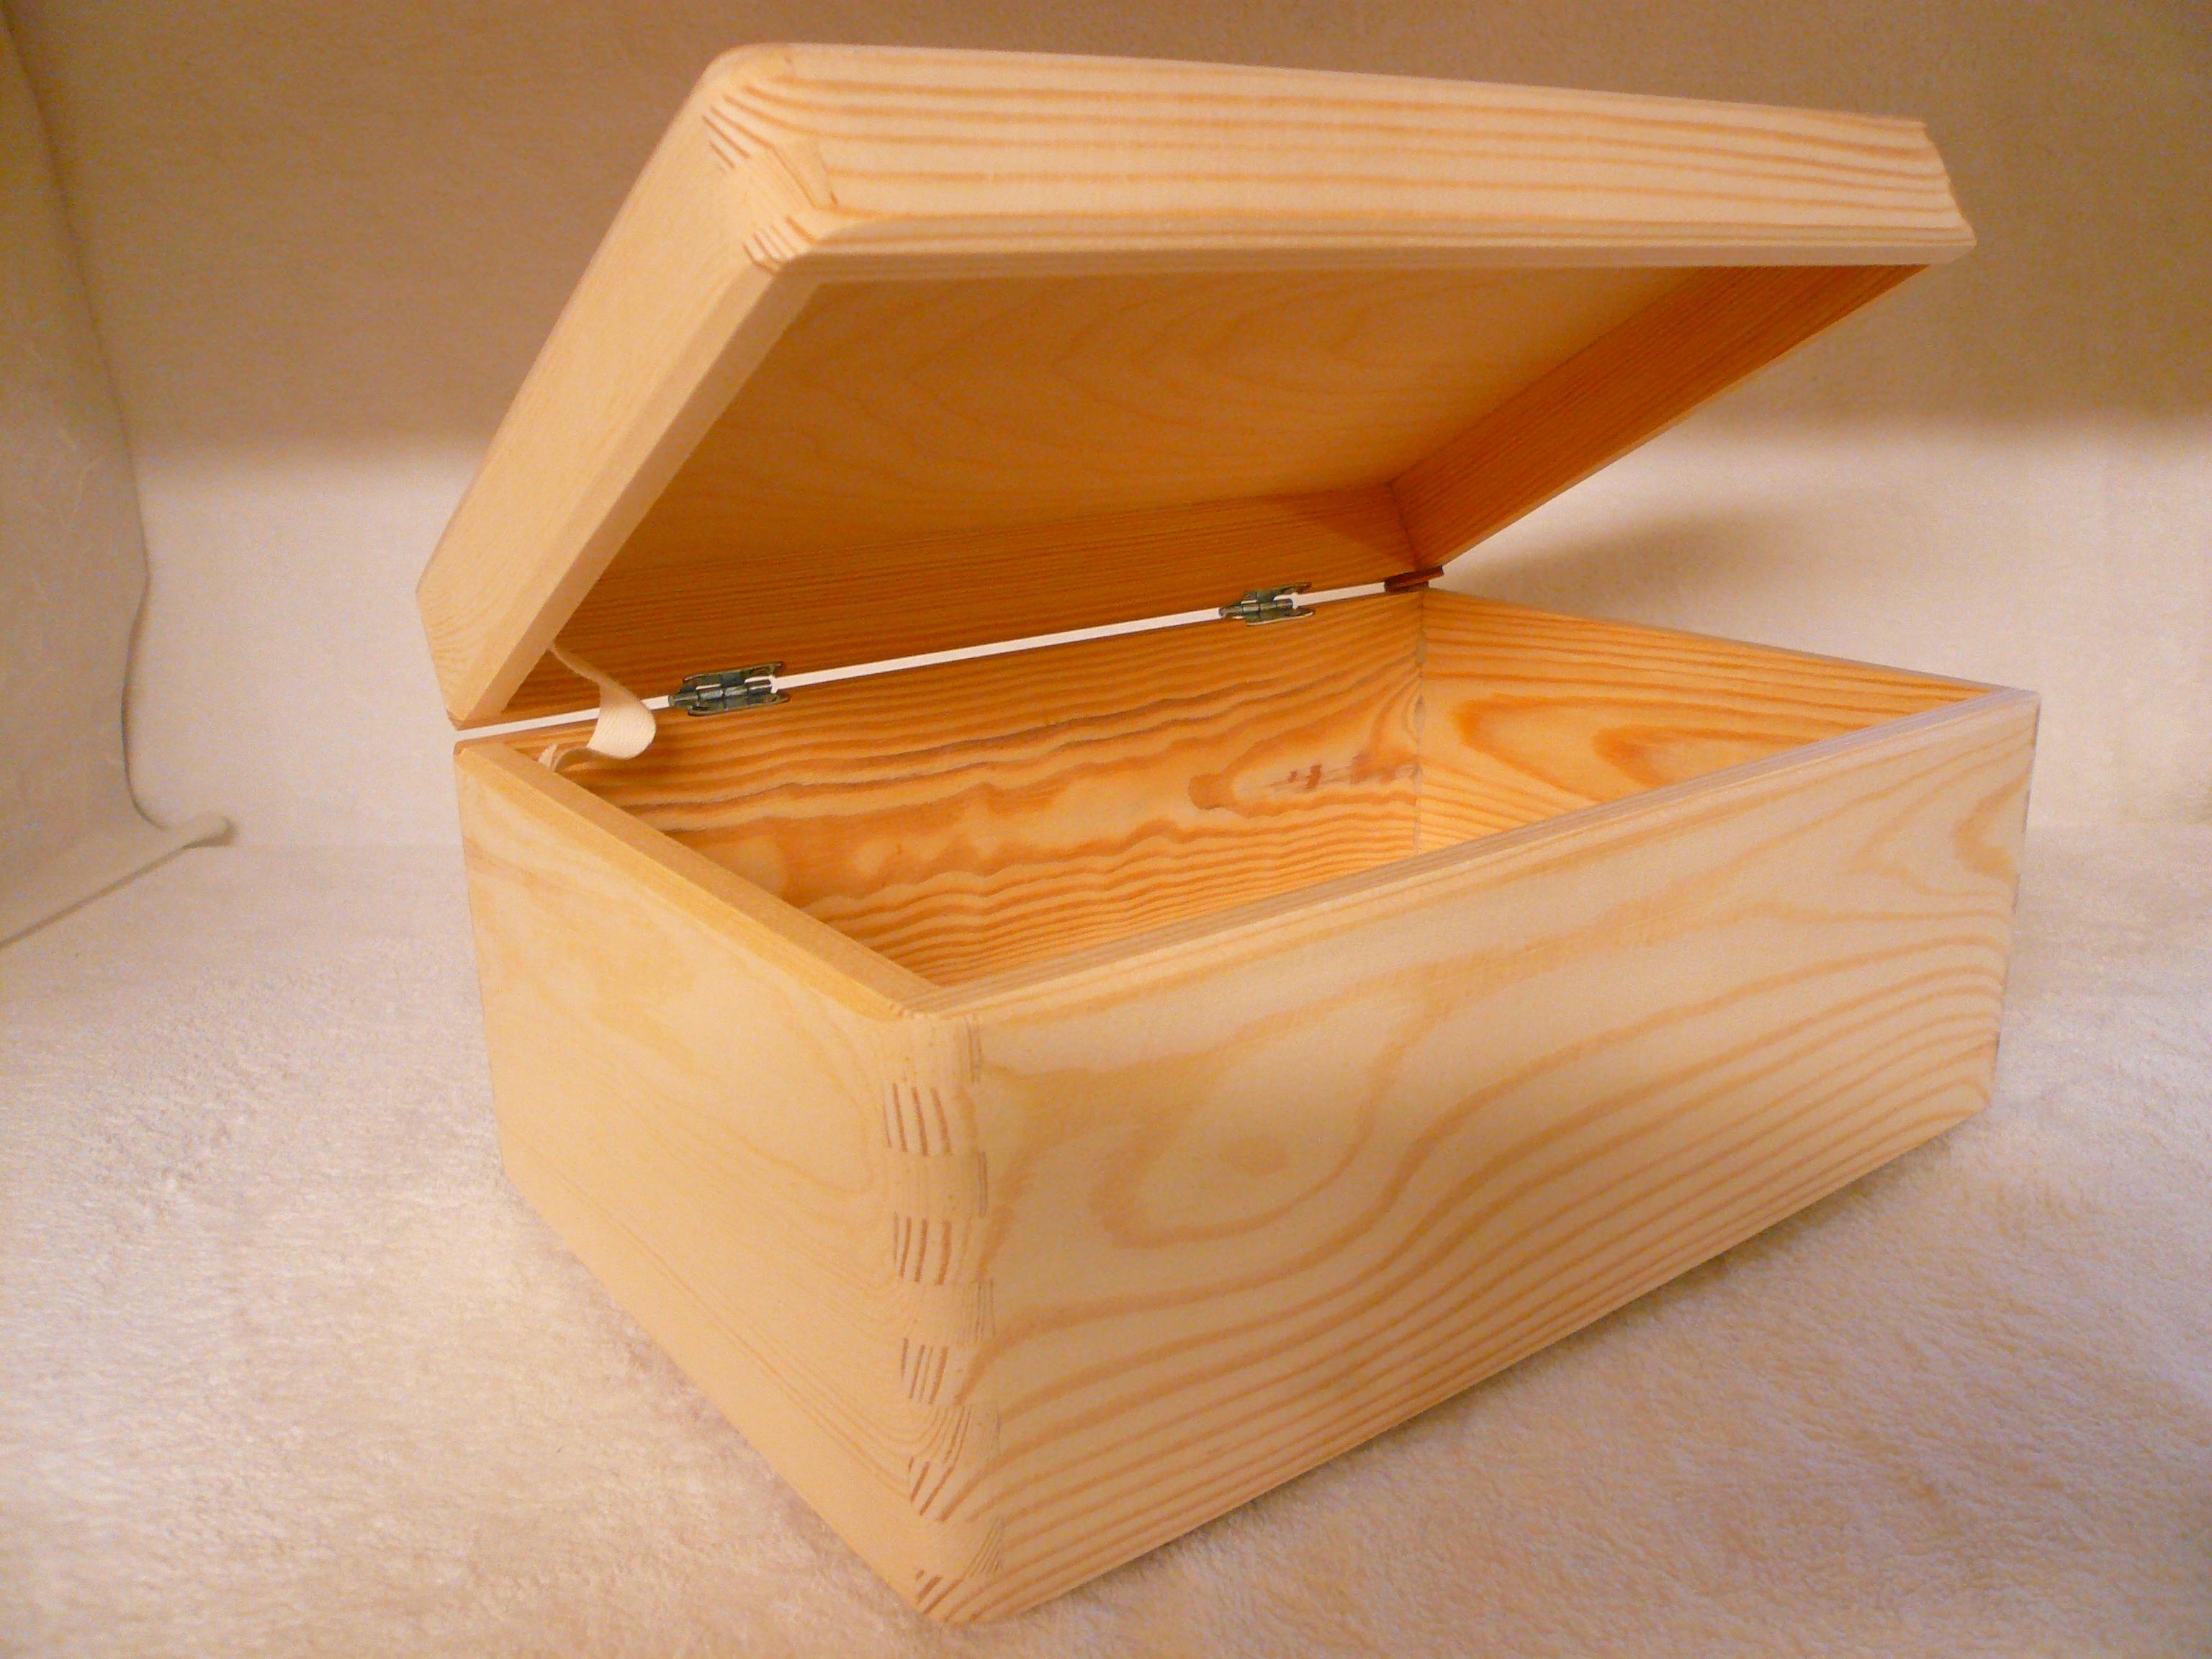 drevo z mas vu obd n kov dreven krabica 30 x 20 x 14cm. Black Bedroom Furniture Sets. Home Design Ideas